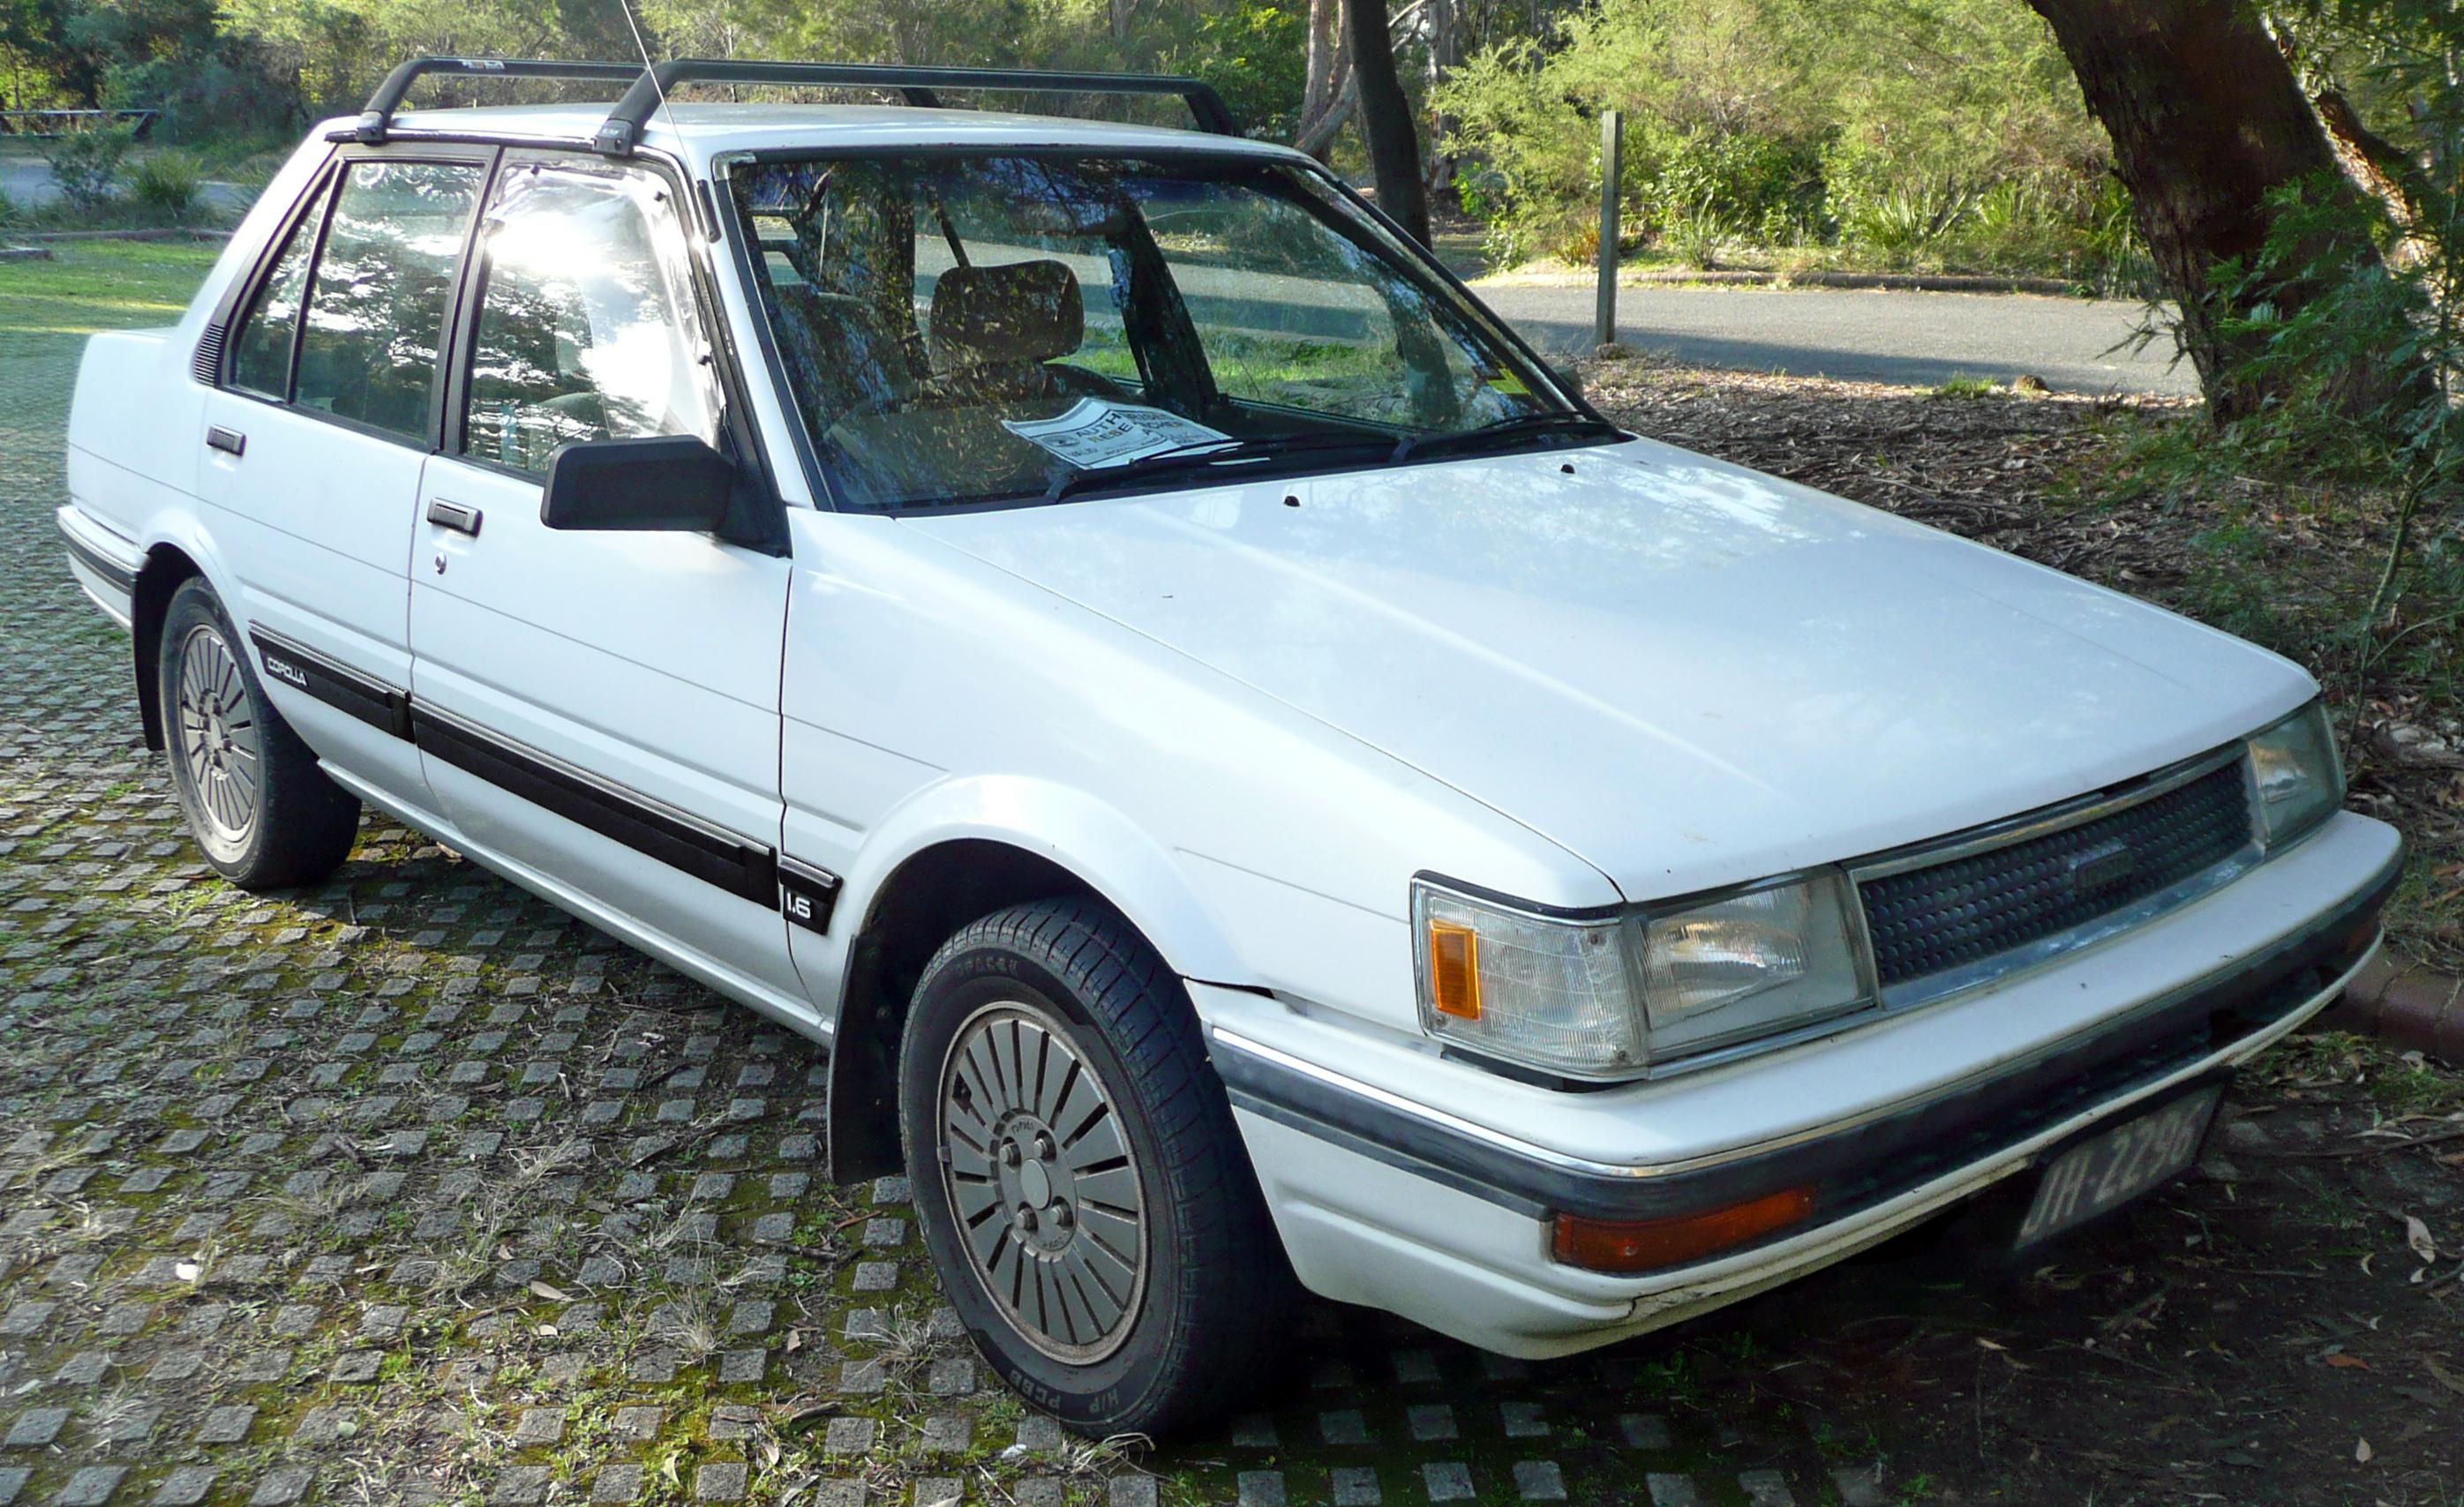 file 1986 1989 toyota corolla ae82 csx sedan 01 jpg wikimedia rh commons wikimedia org 2015 Toyota Corolla 2007 Toyota Corolla